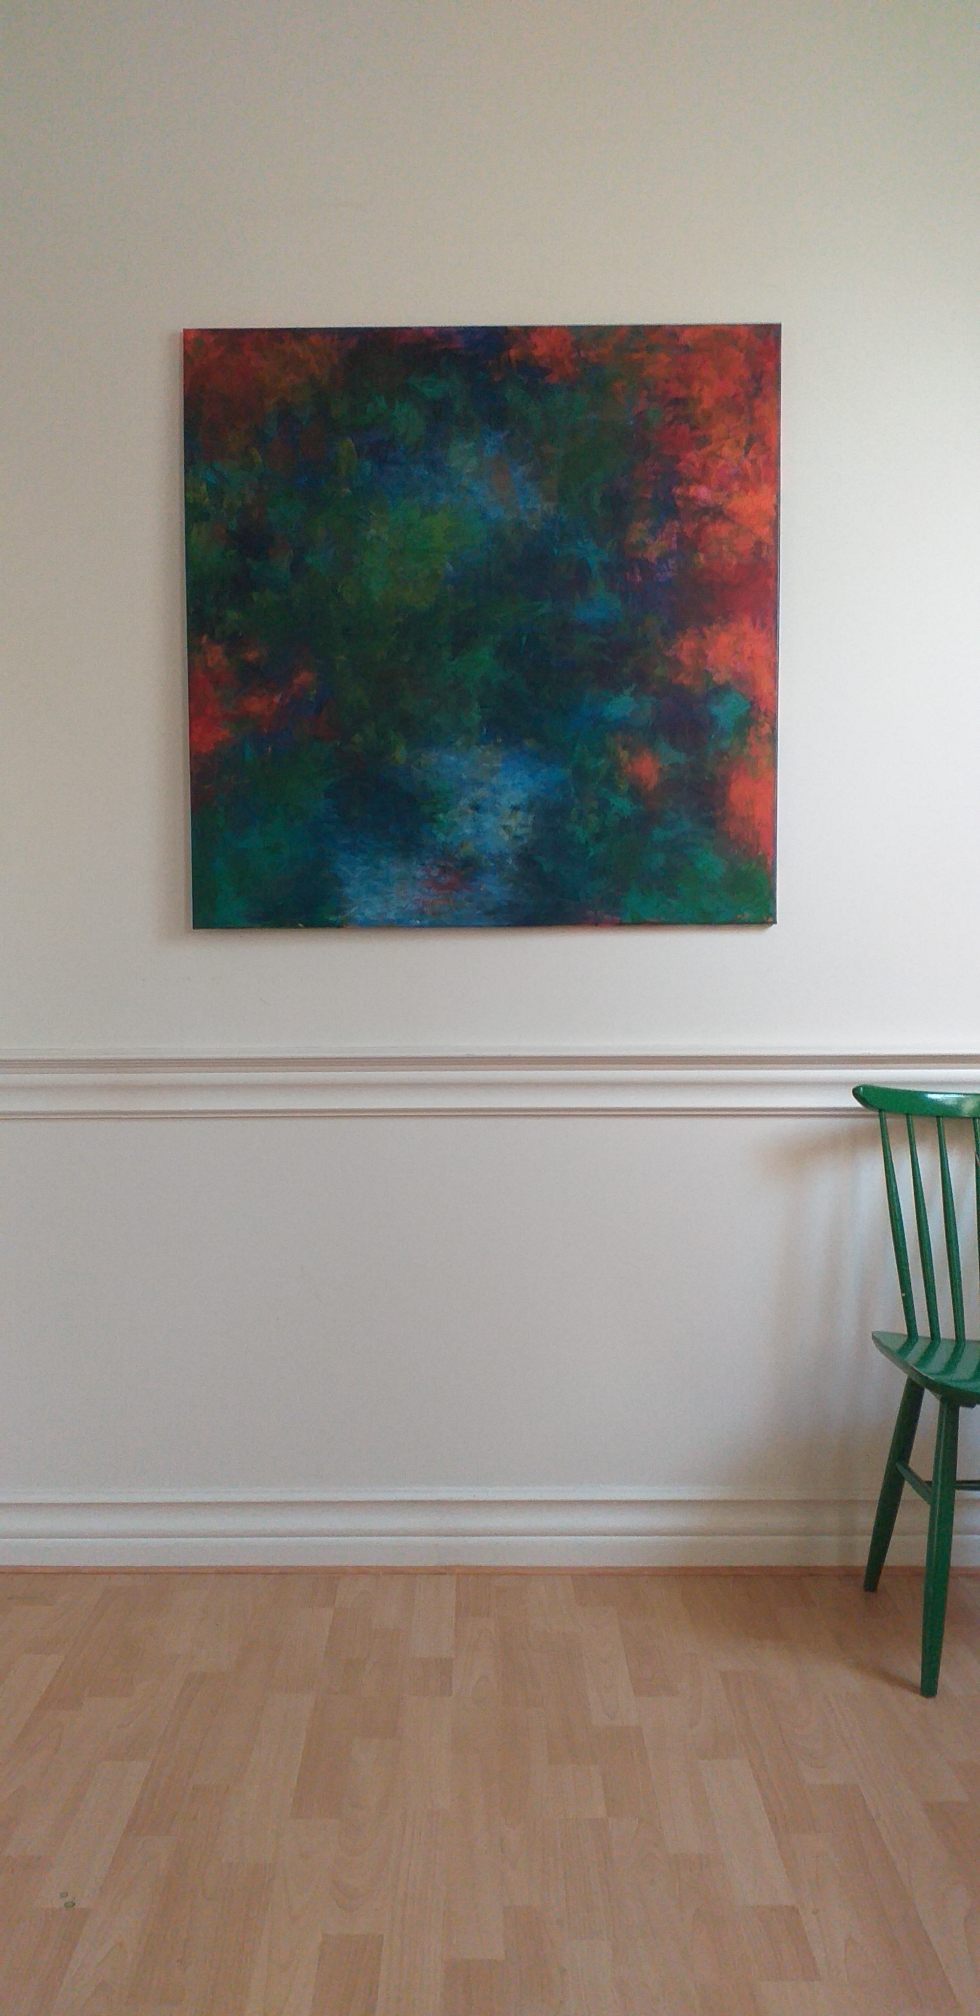 100x100cm acrylic on canvas 'Orange, blue and green 2020